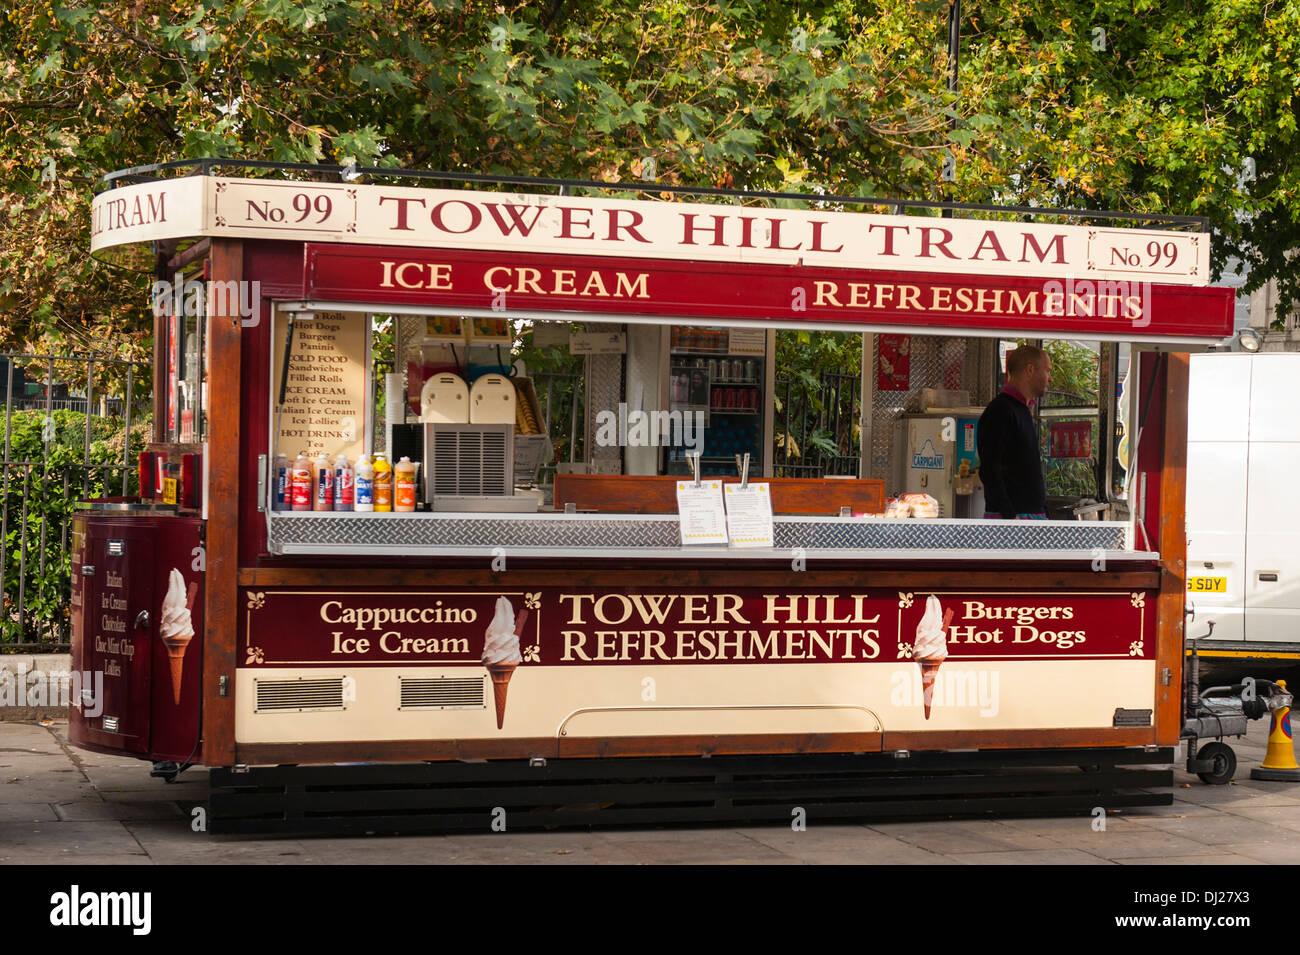 City of London Tower Hill mock Tram no 99 ice cream original creative  refreshments car cart kiosk stall diner trailer Stock Photo